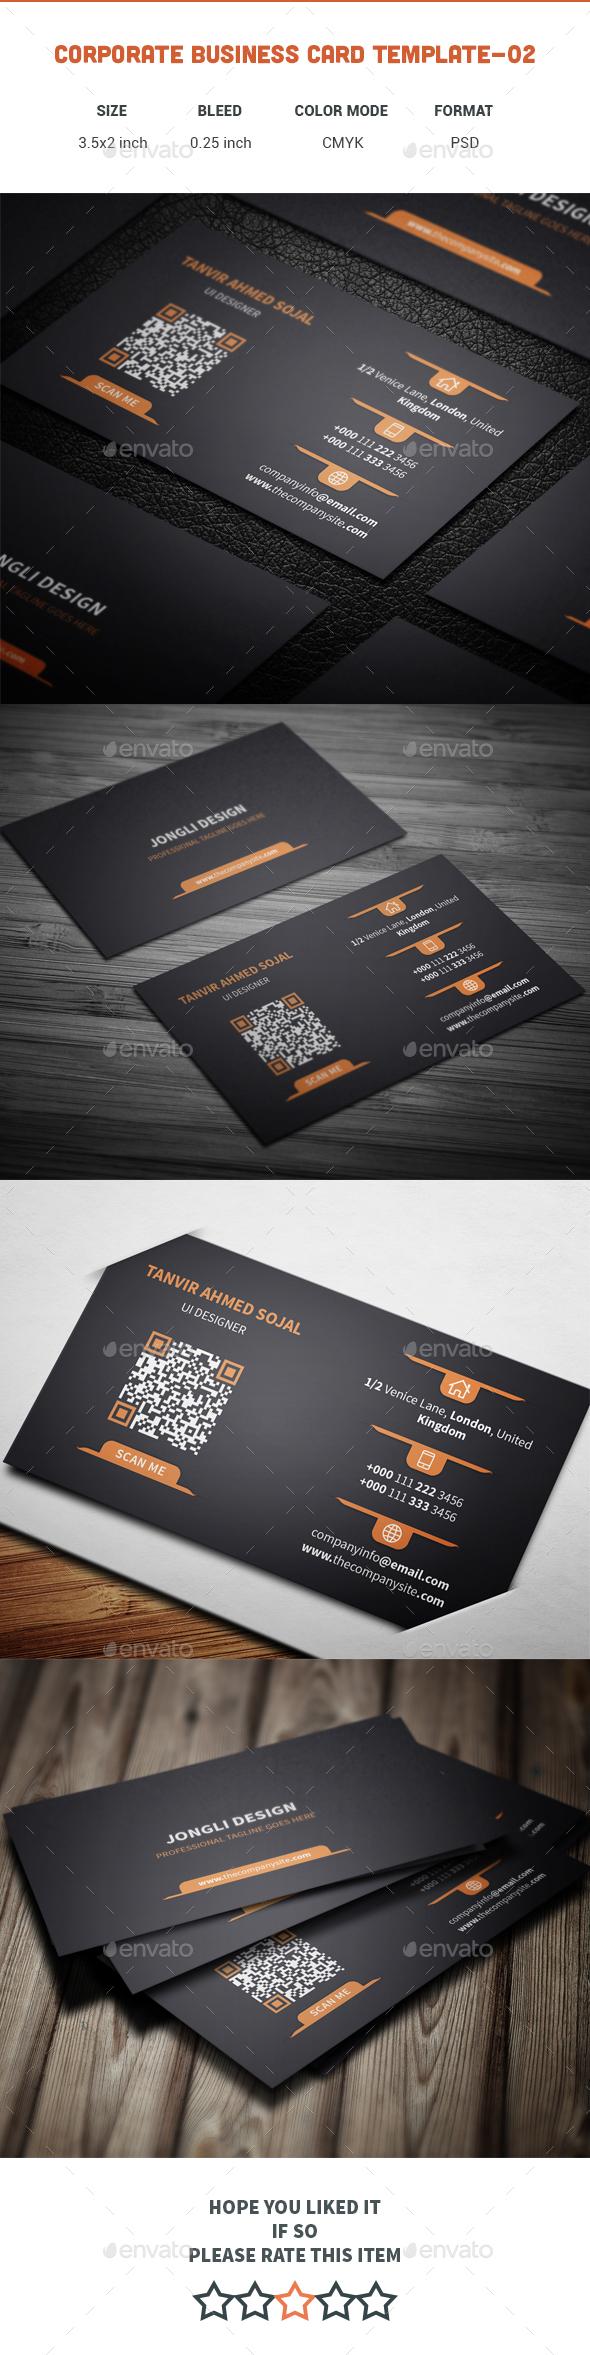 Corporate Business Card Template-02 - Corporate Business Cards